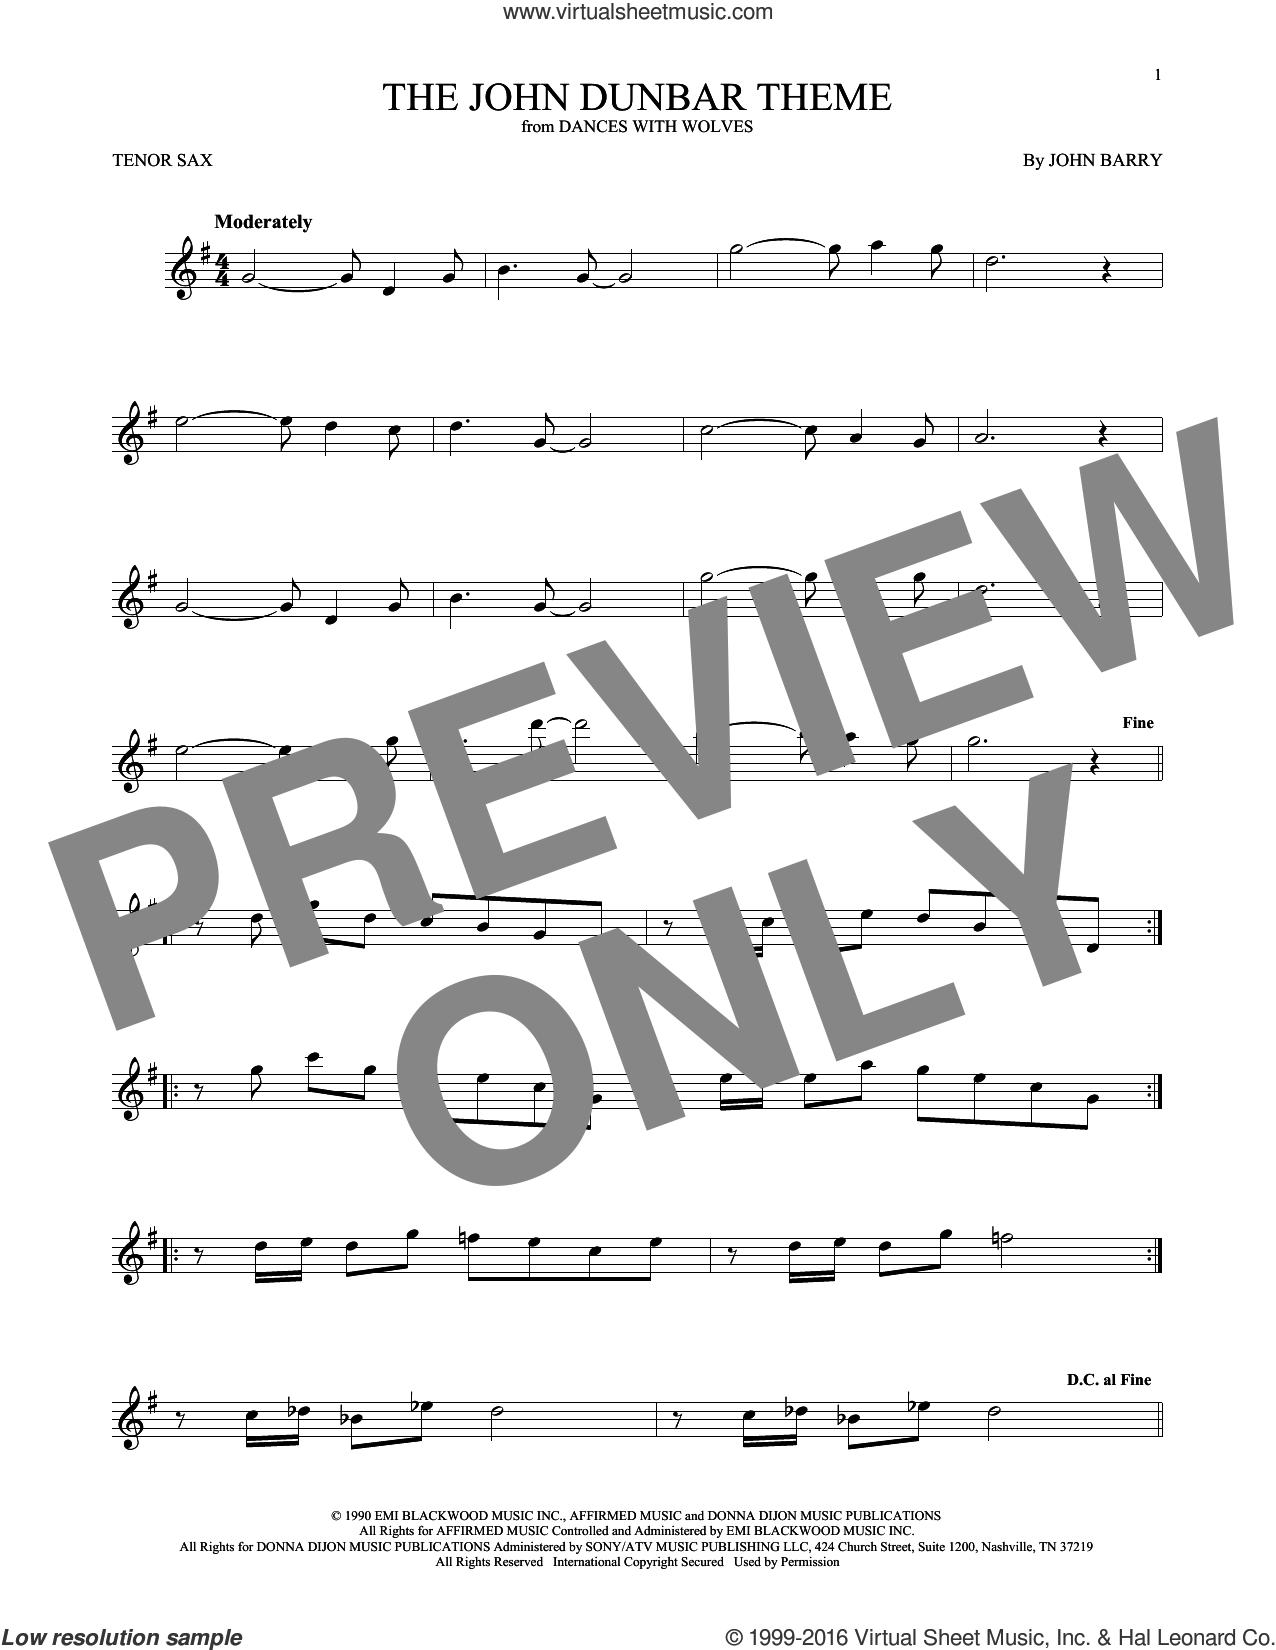 The John Dunbar Theme sheet music for tenor saxophone solo by John Barry, intermediate skill level